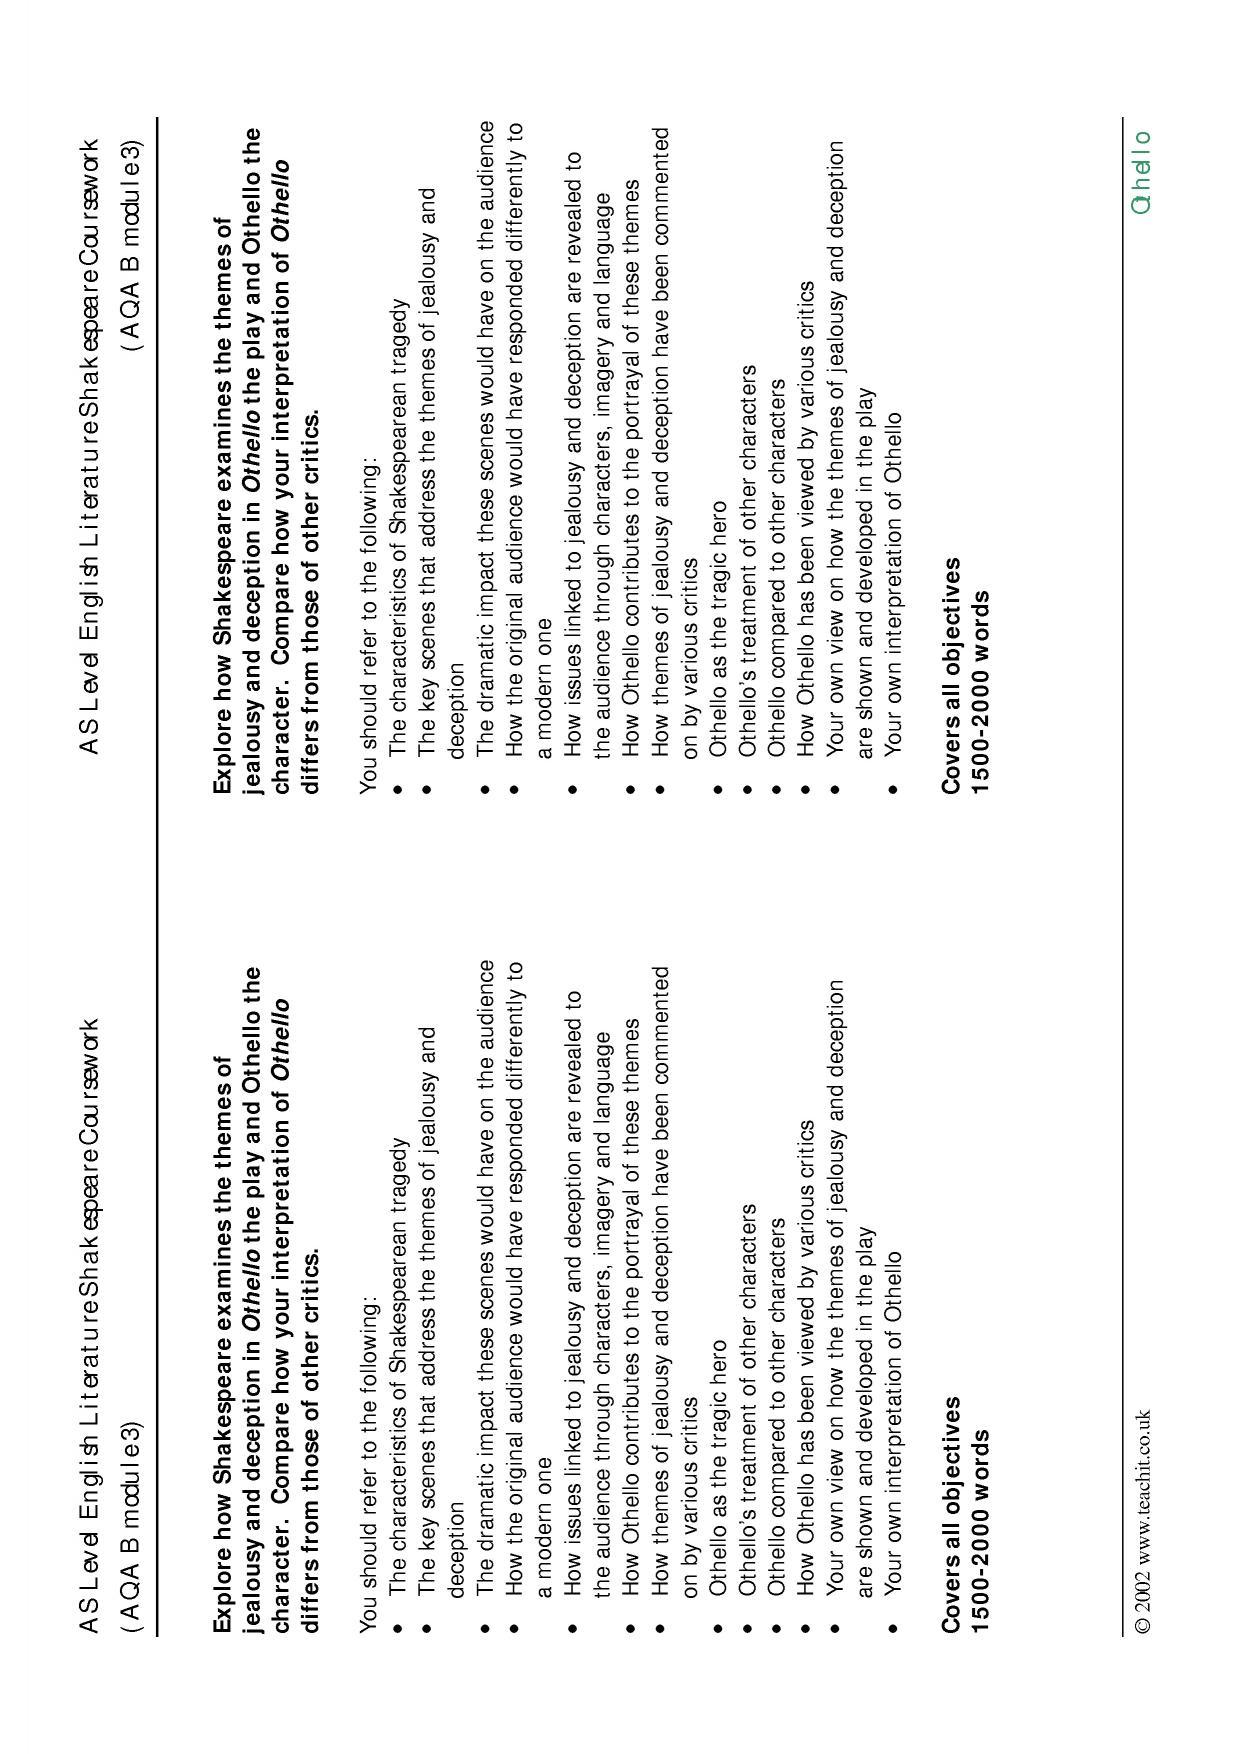 Discount codes for essays professionals